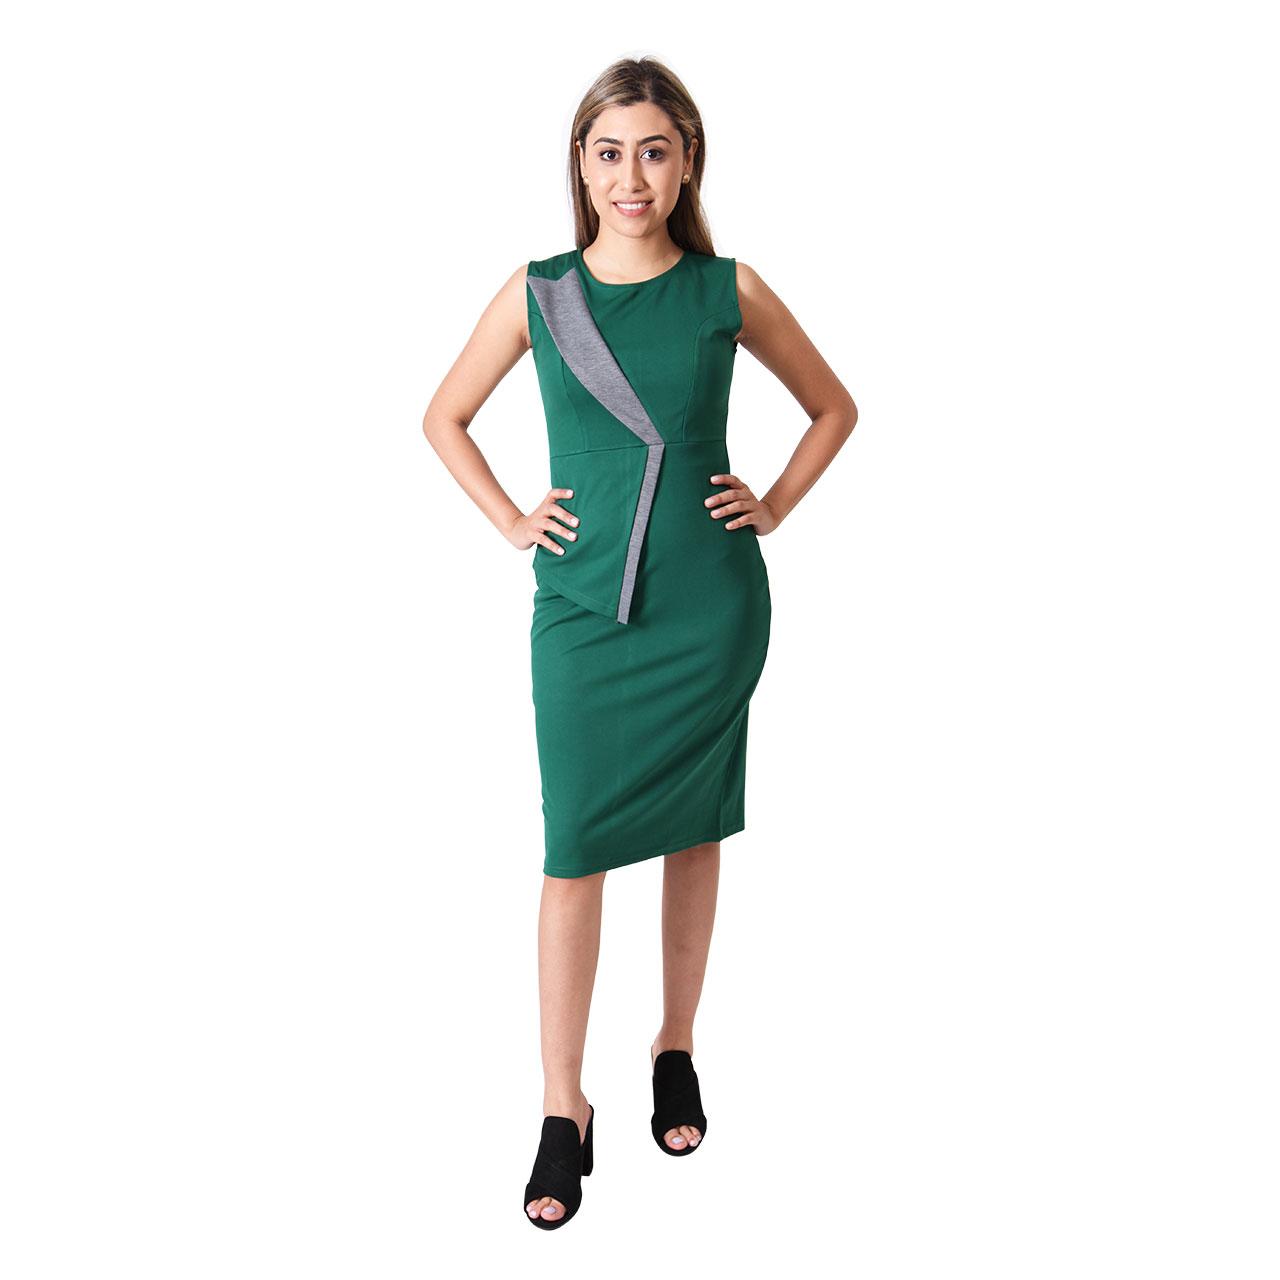 Round-Neck Knee-Length Patchwork Sleeveless Green Slim Fit Bodycon Dress